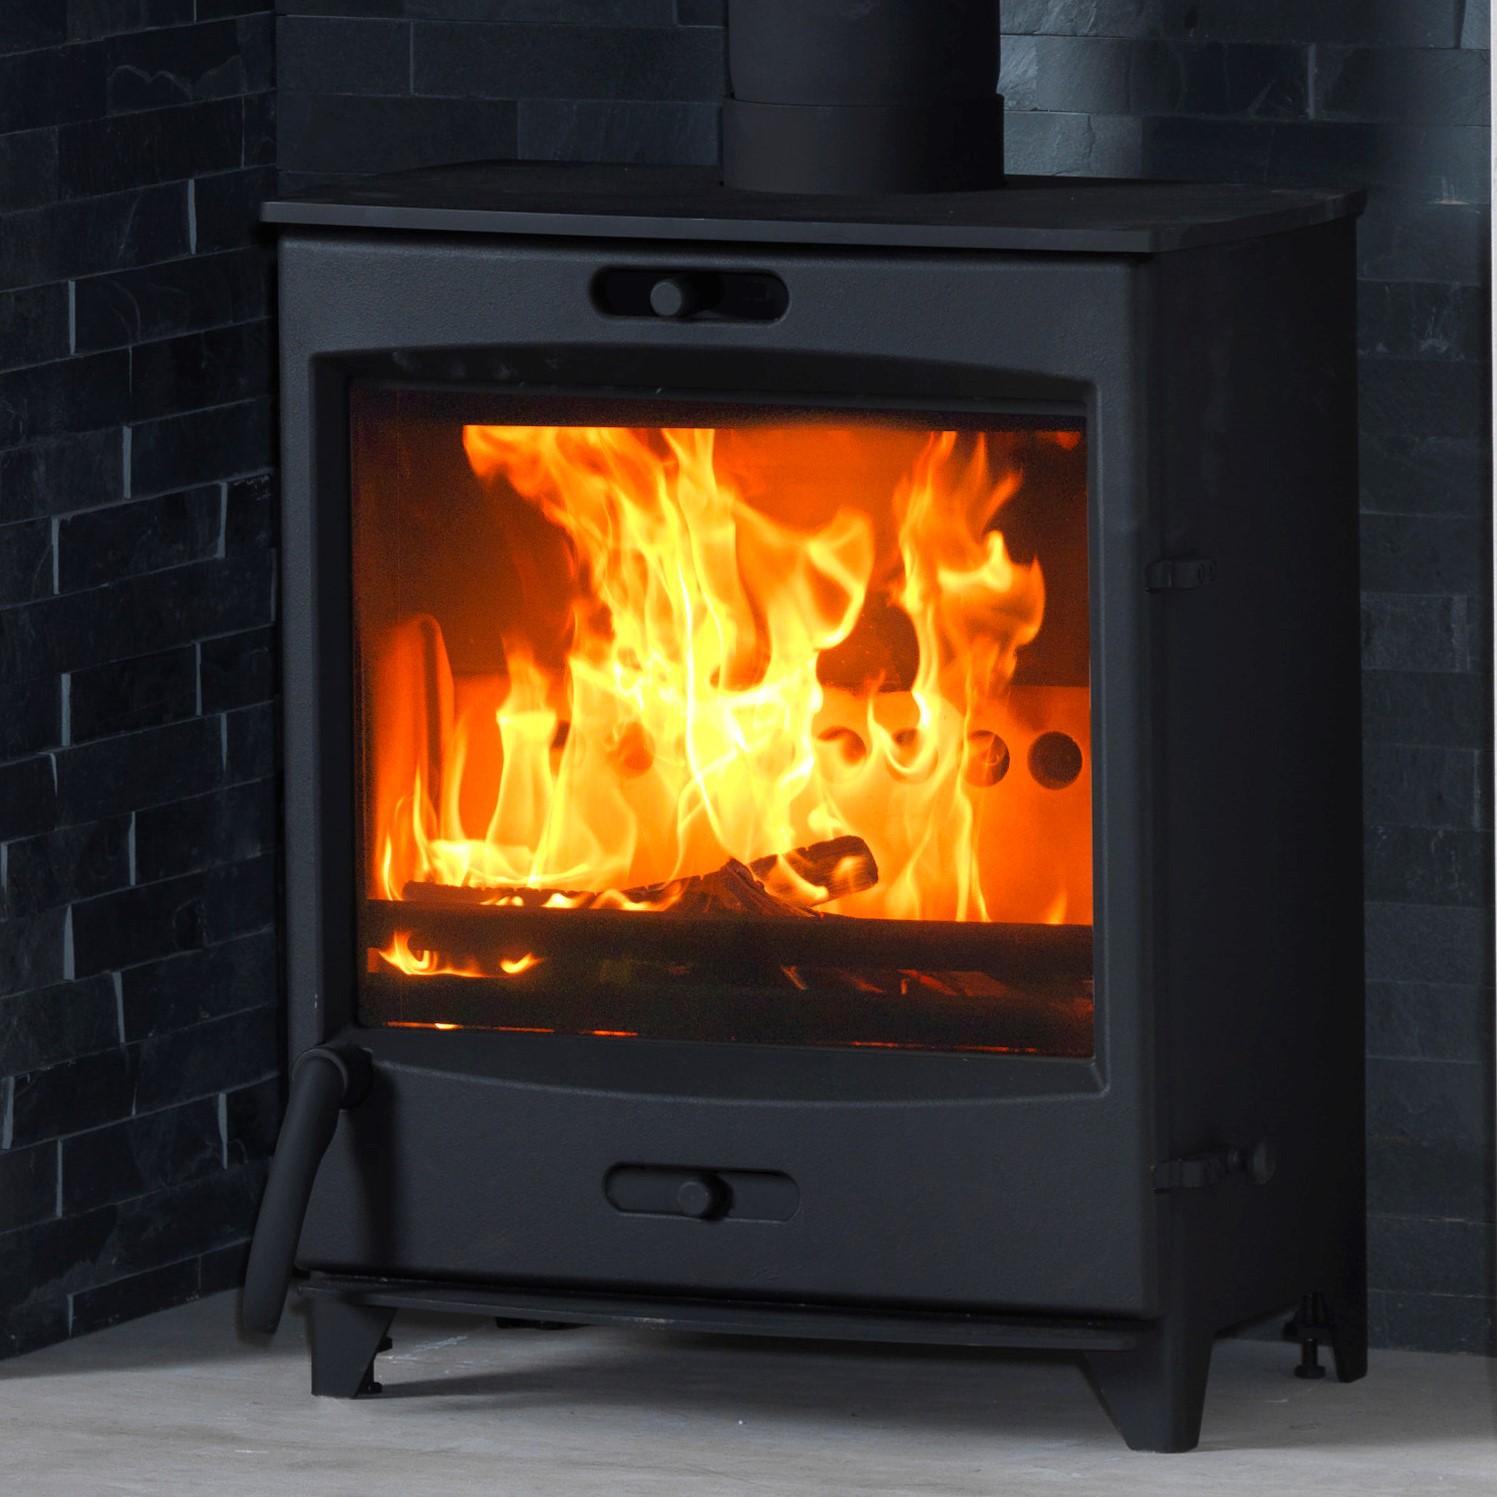 Fireline FQ5 Eco